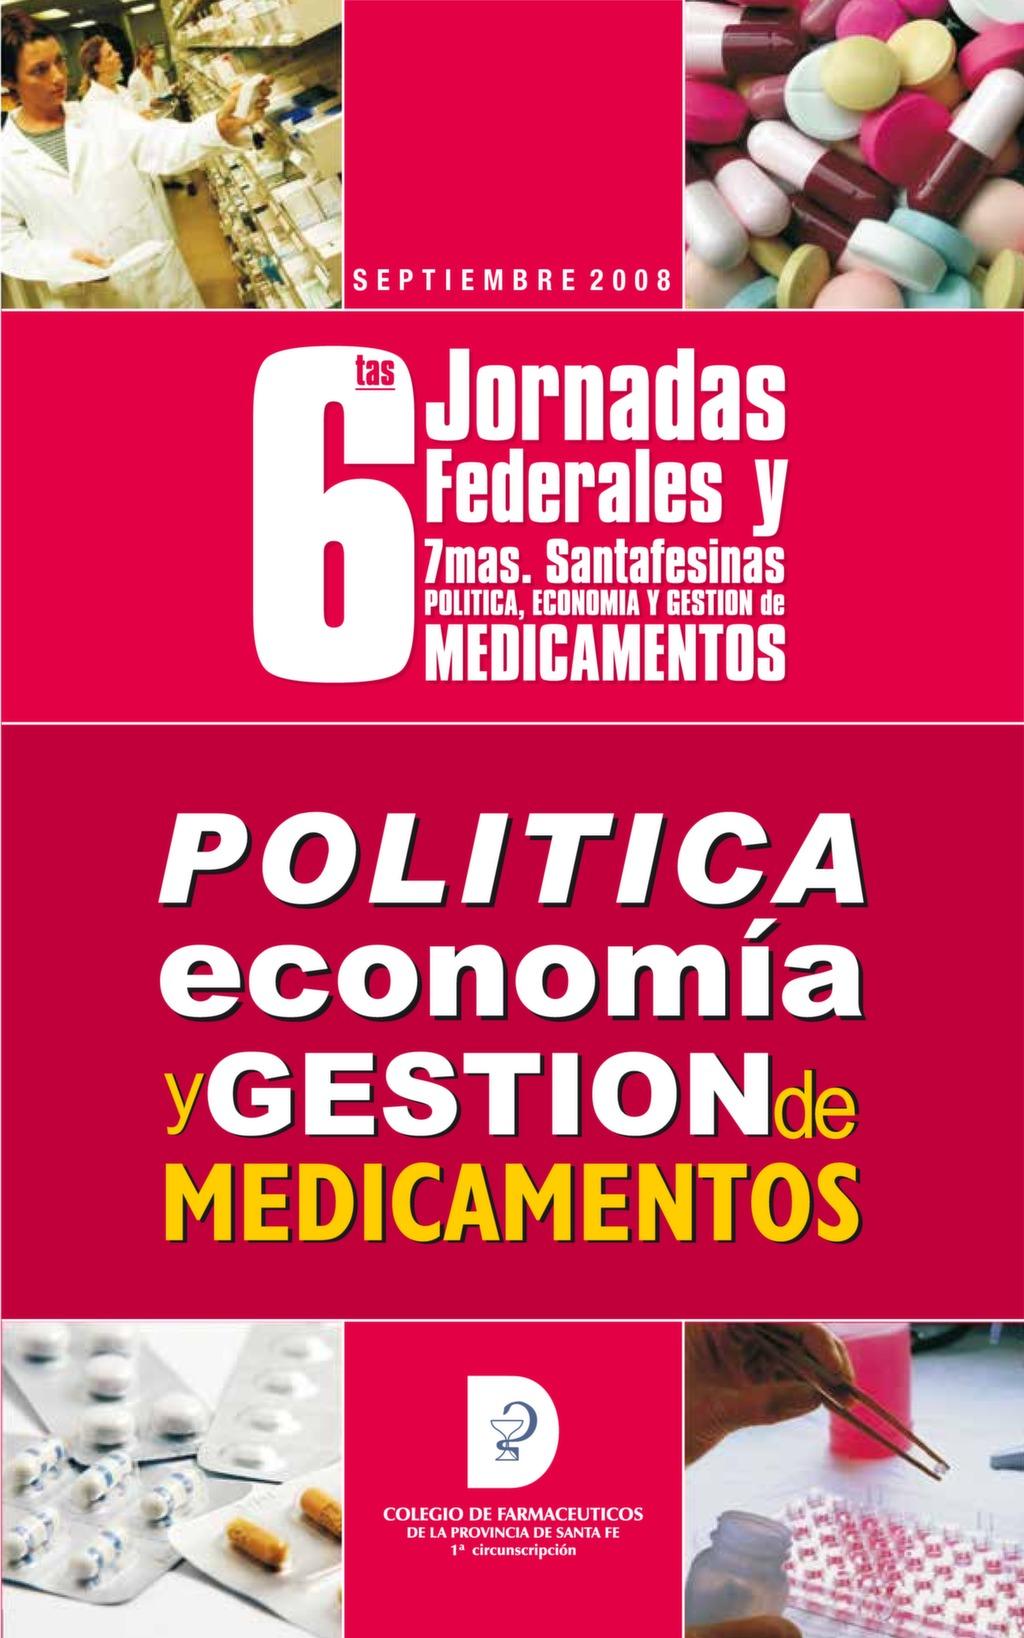 Jornadas 2008 Image